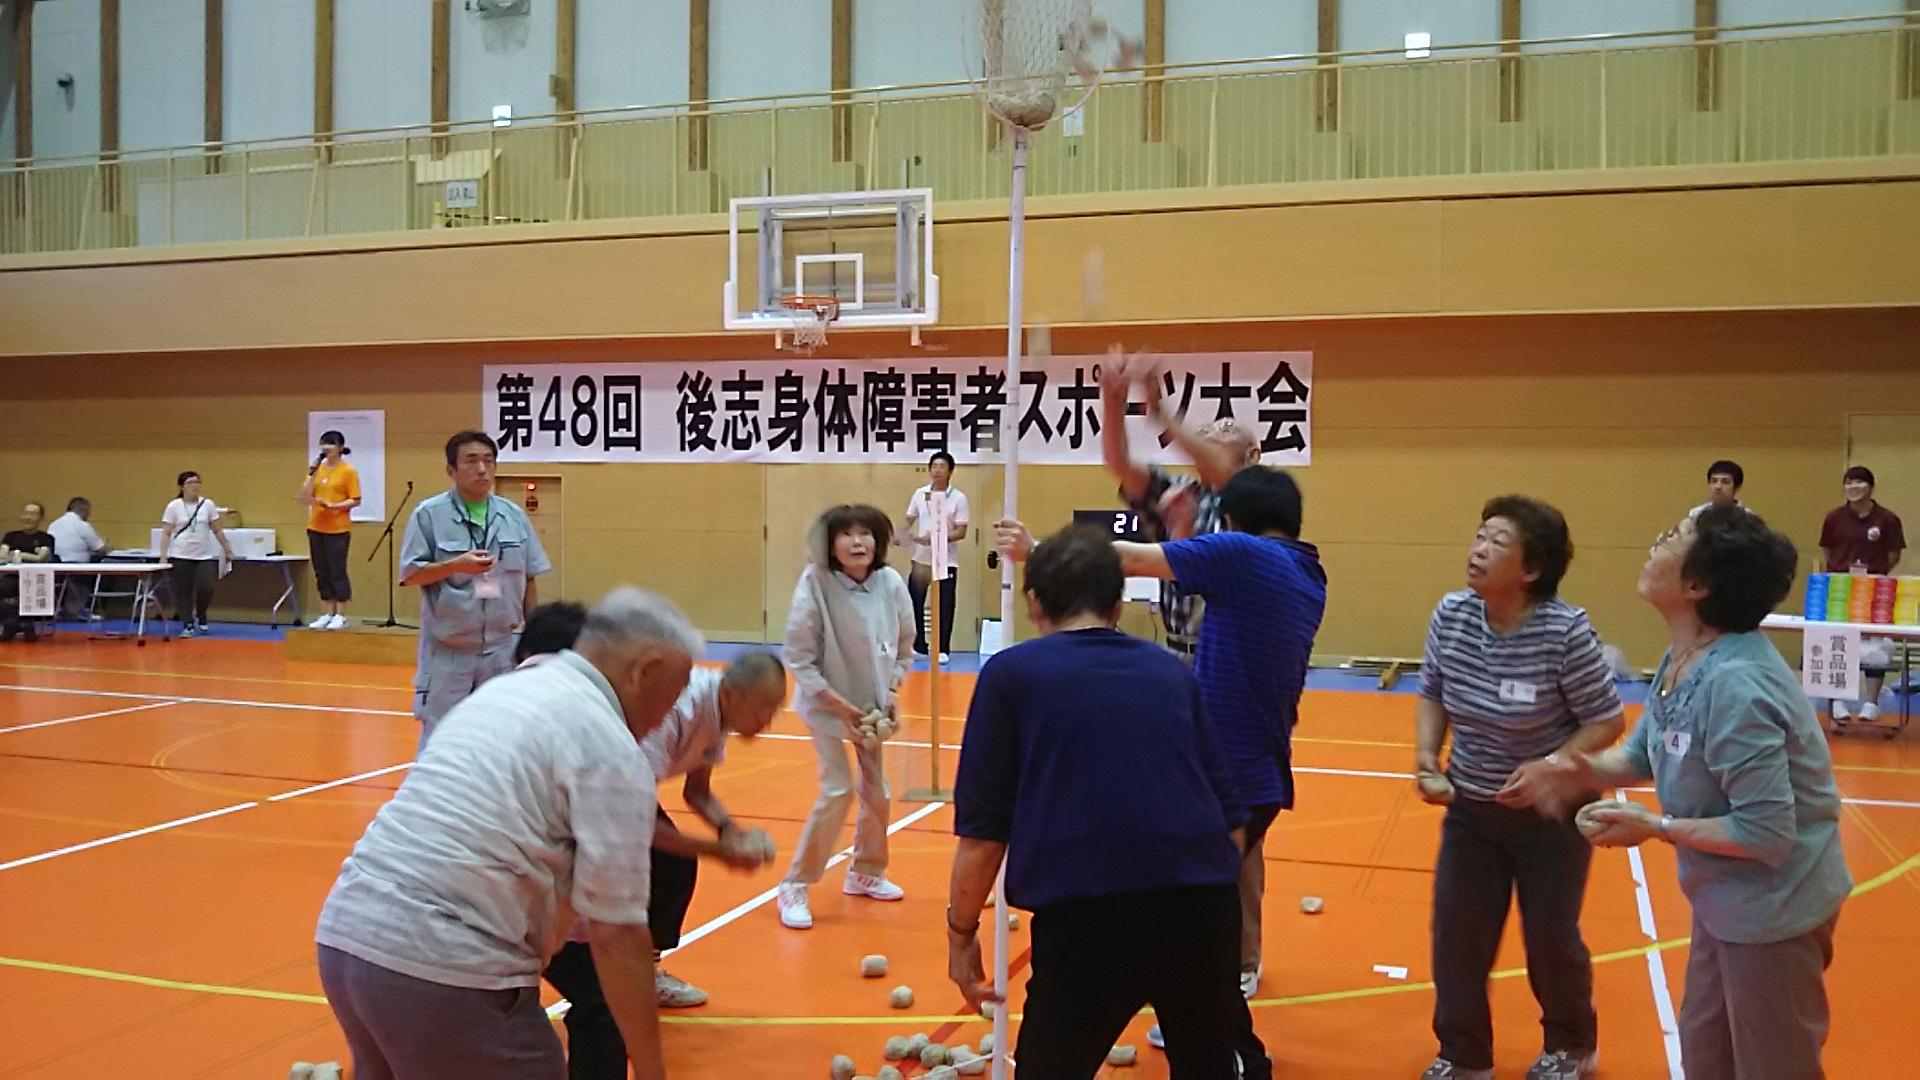 第48回後志身体障害者スポーツ大会成績